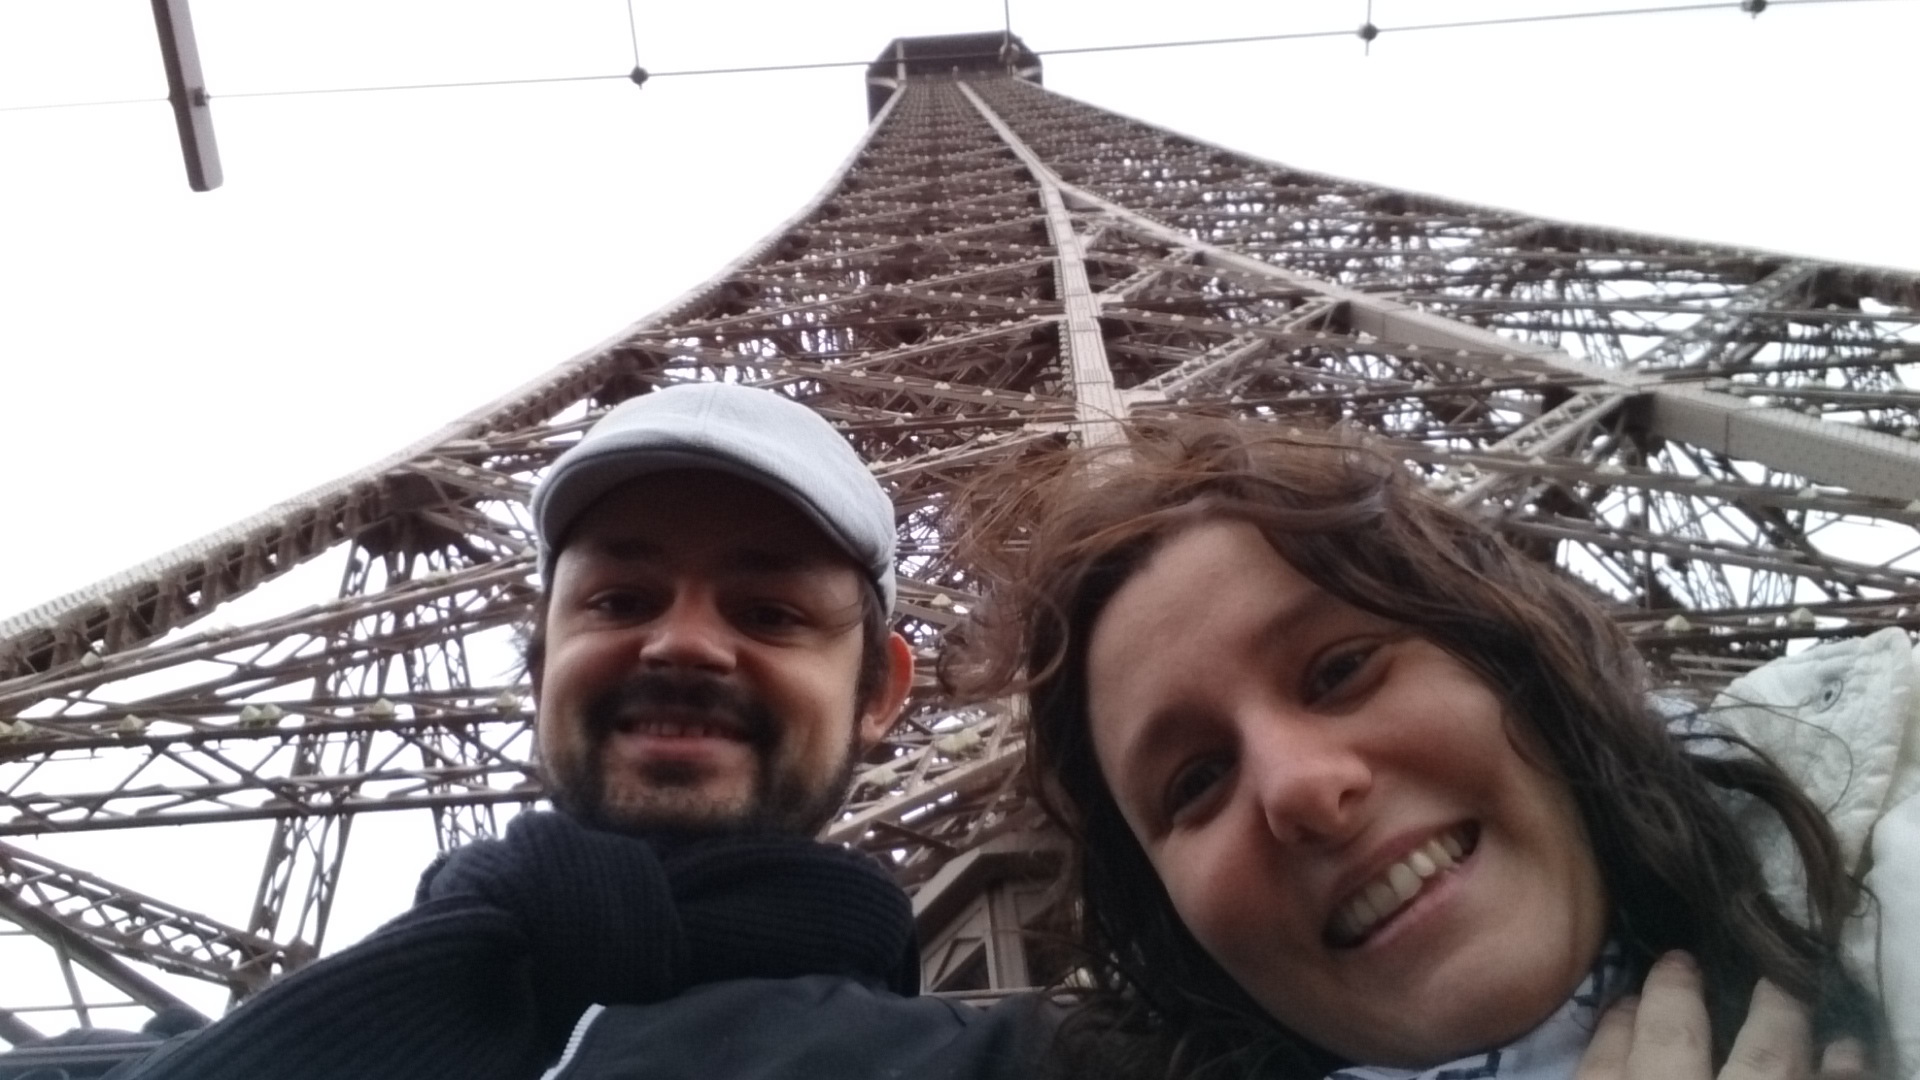 DSC 1924 - Visitando la Torre Eiffel en Paris